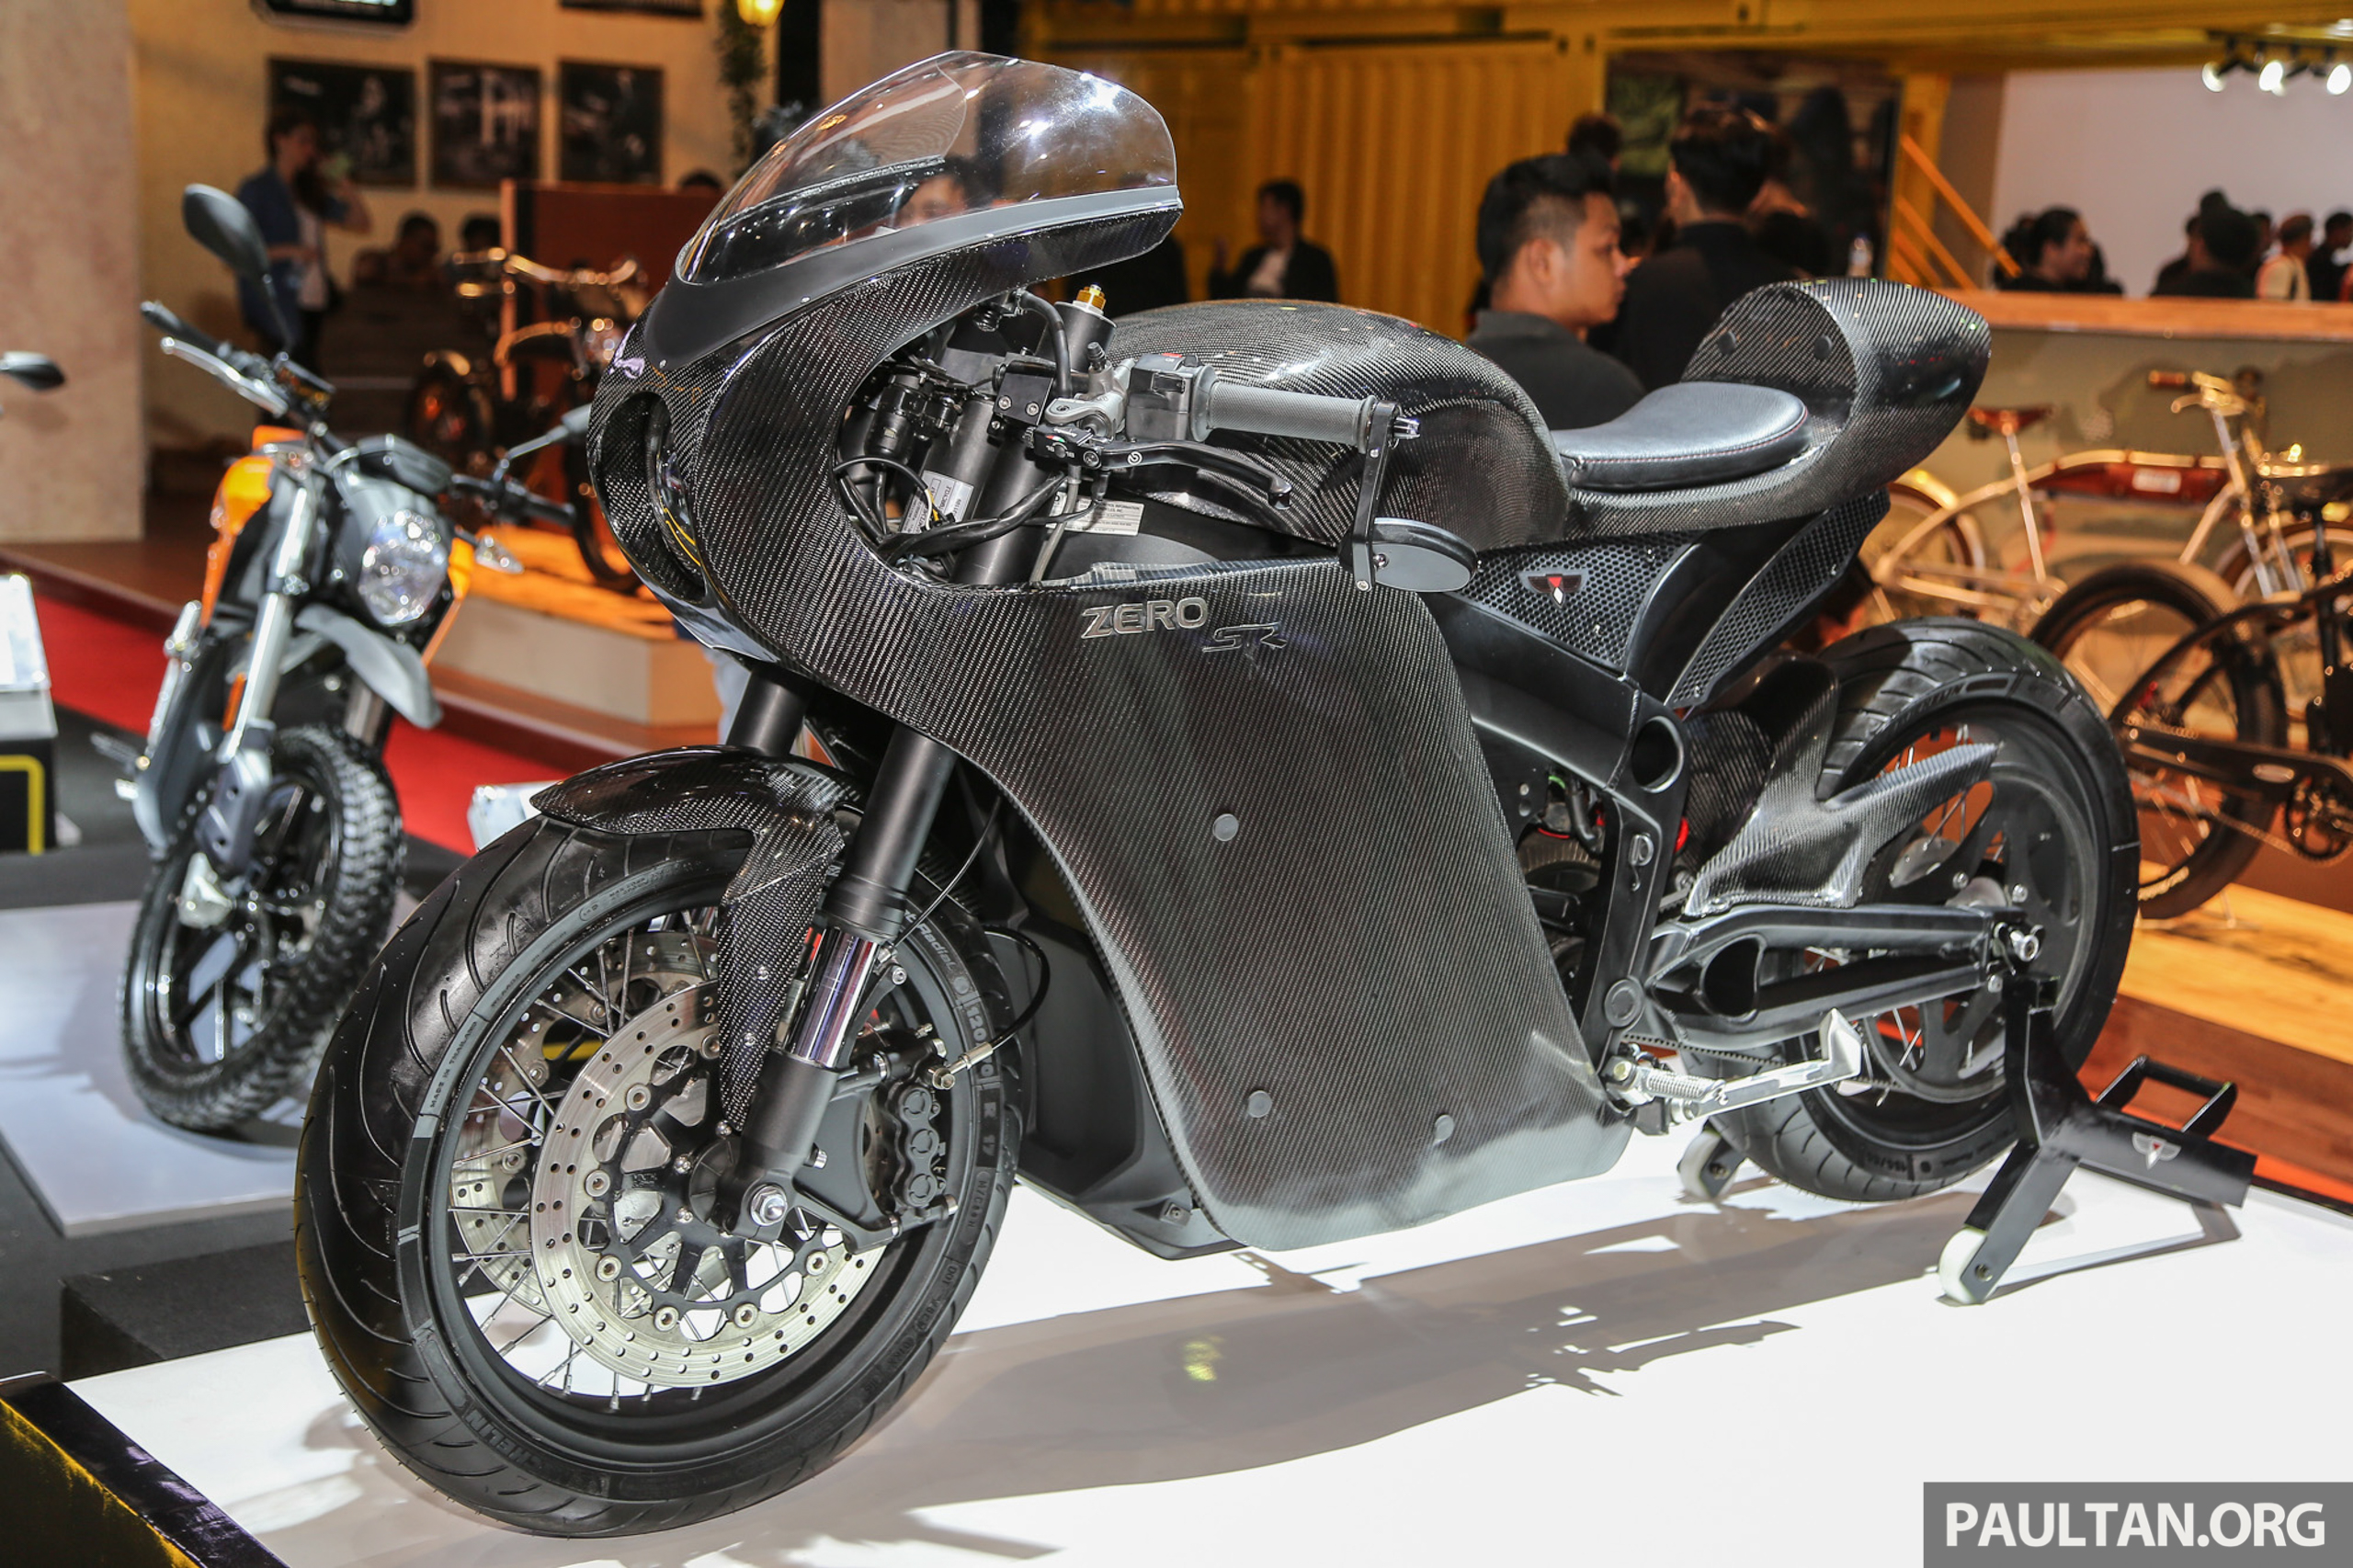 iims 2016 zero motorcycles e bikes on display. Black Bedroom Furniture Sets. Home Design Ideas